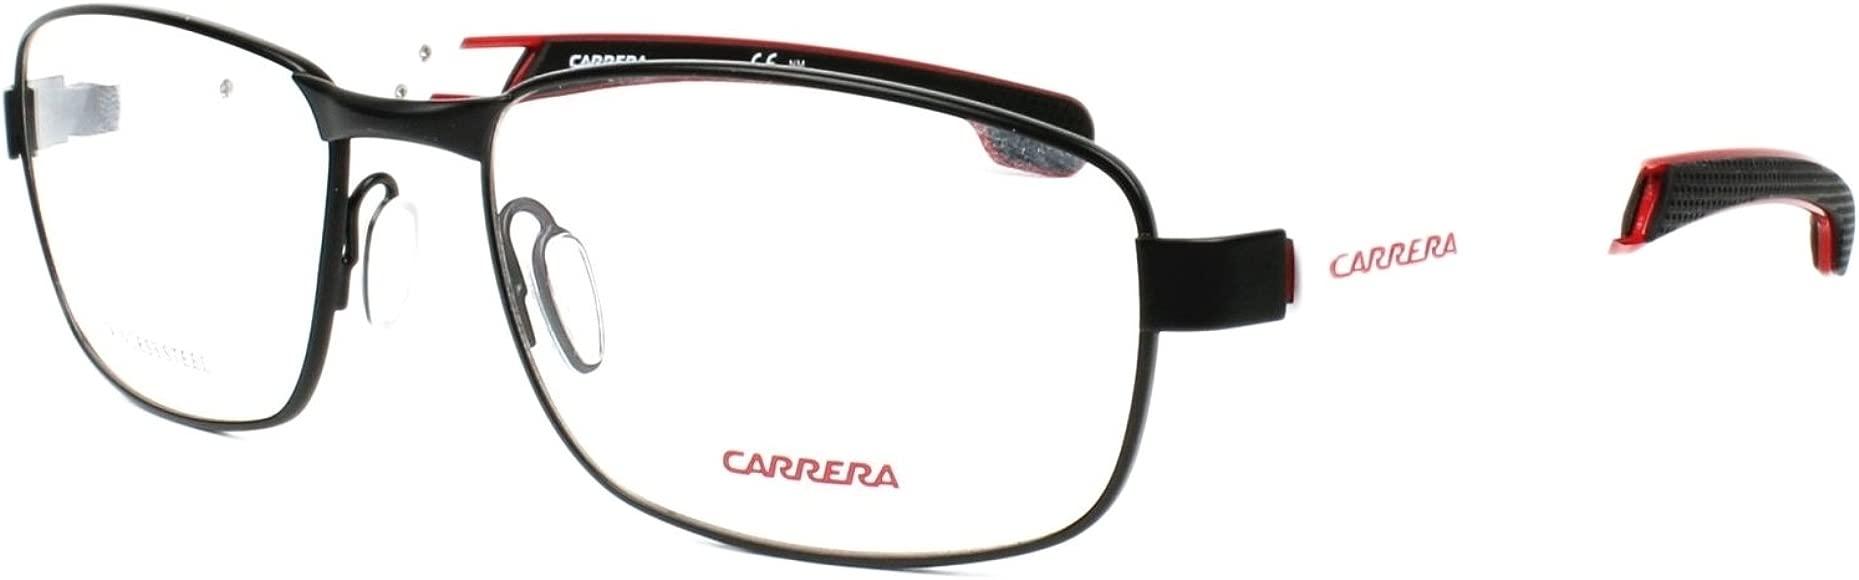 Carrera 4405//V Eyeglass Frames CA4405-0003-5617 Distance Lens Diameter 56mm Matte Black Frame